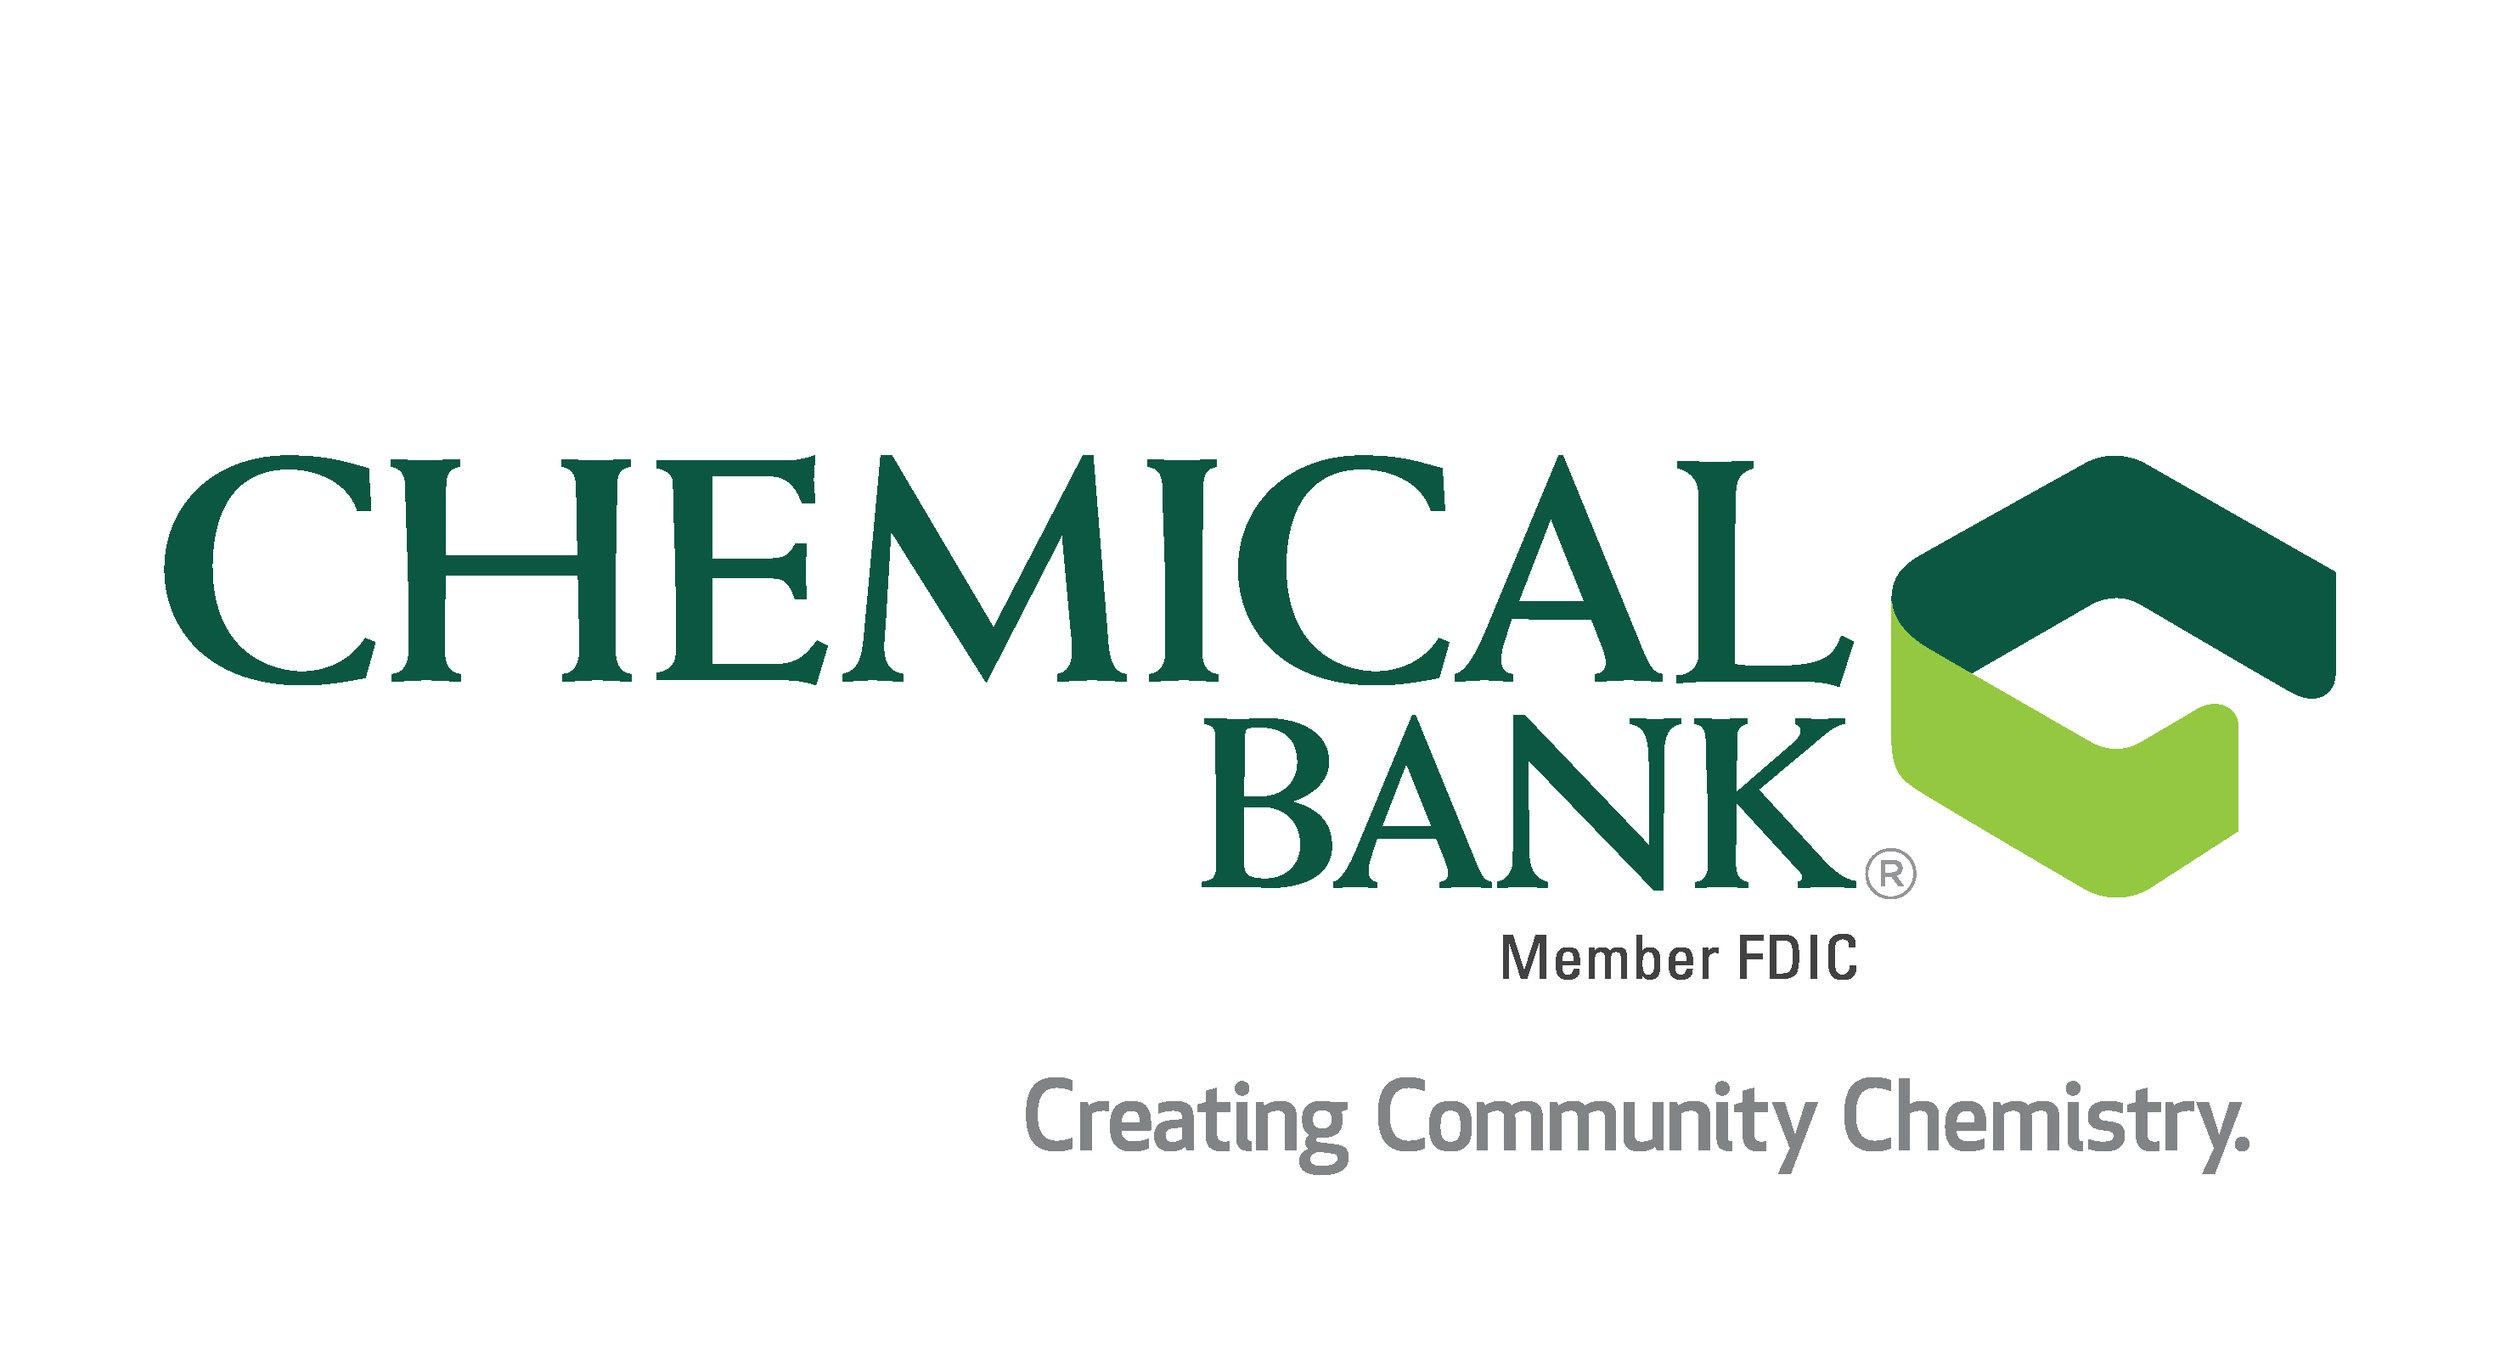 Chemical Bank logo.jpg